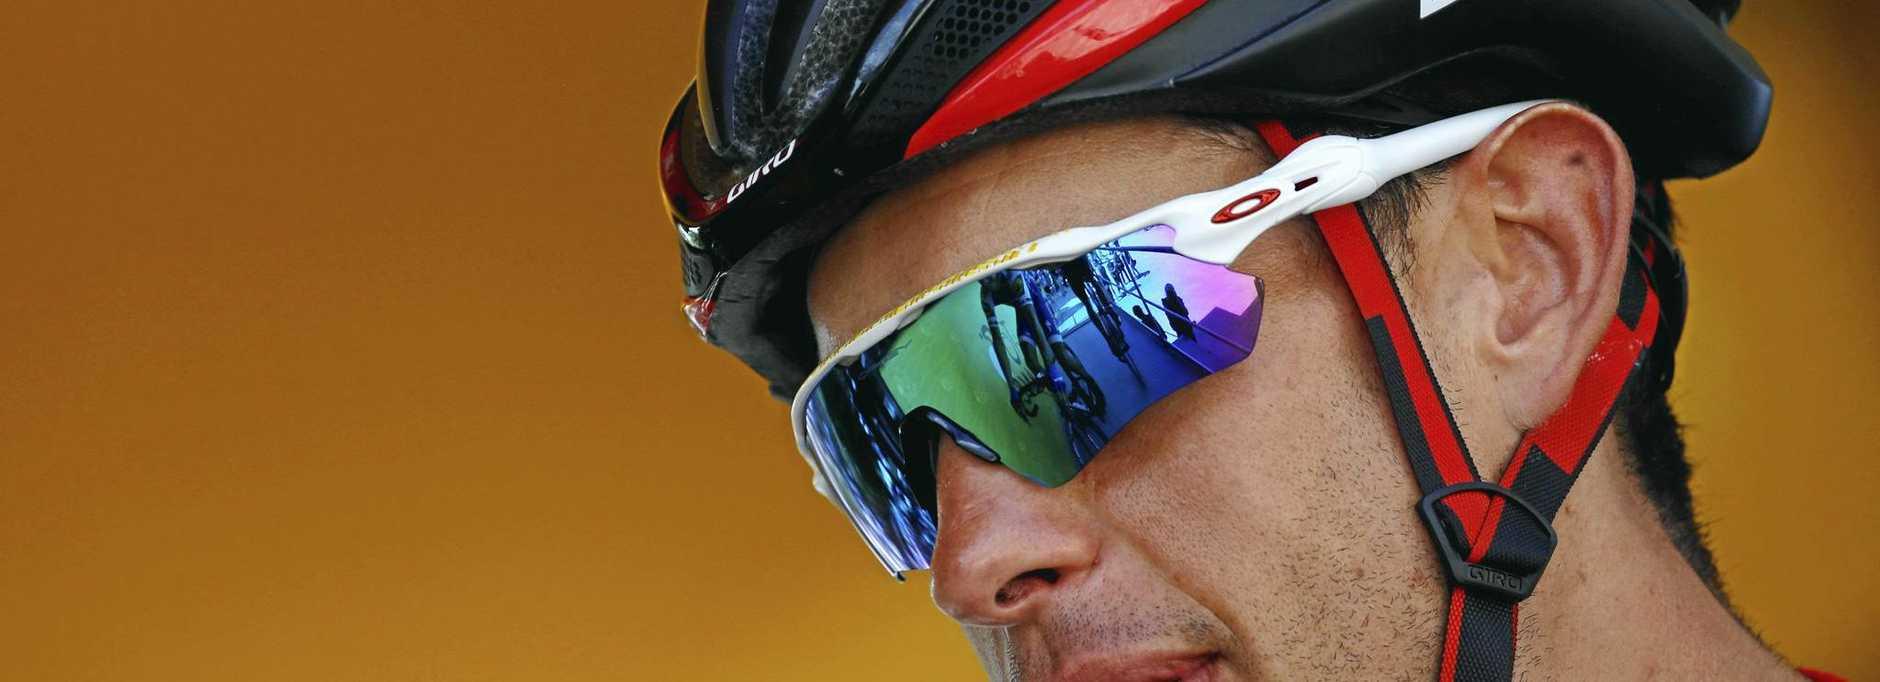 Richie Porte is determined to make a speedy return. (AP Photo/Peter Dejong)